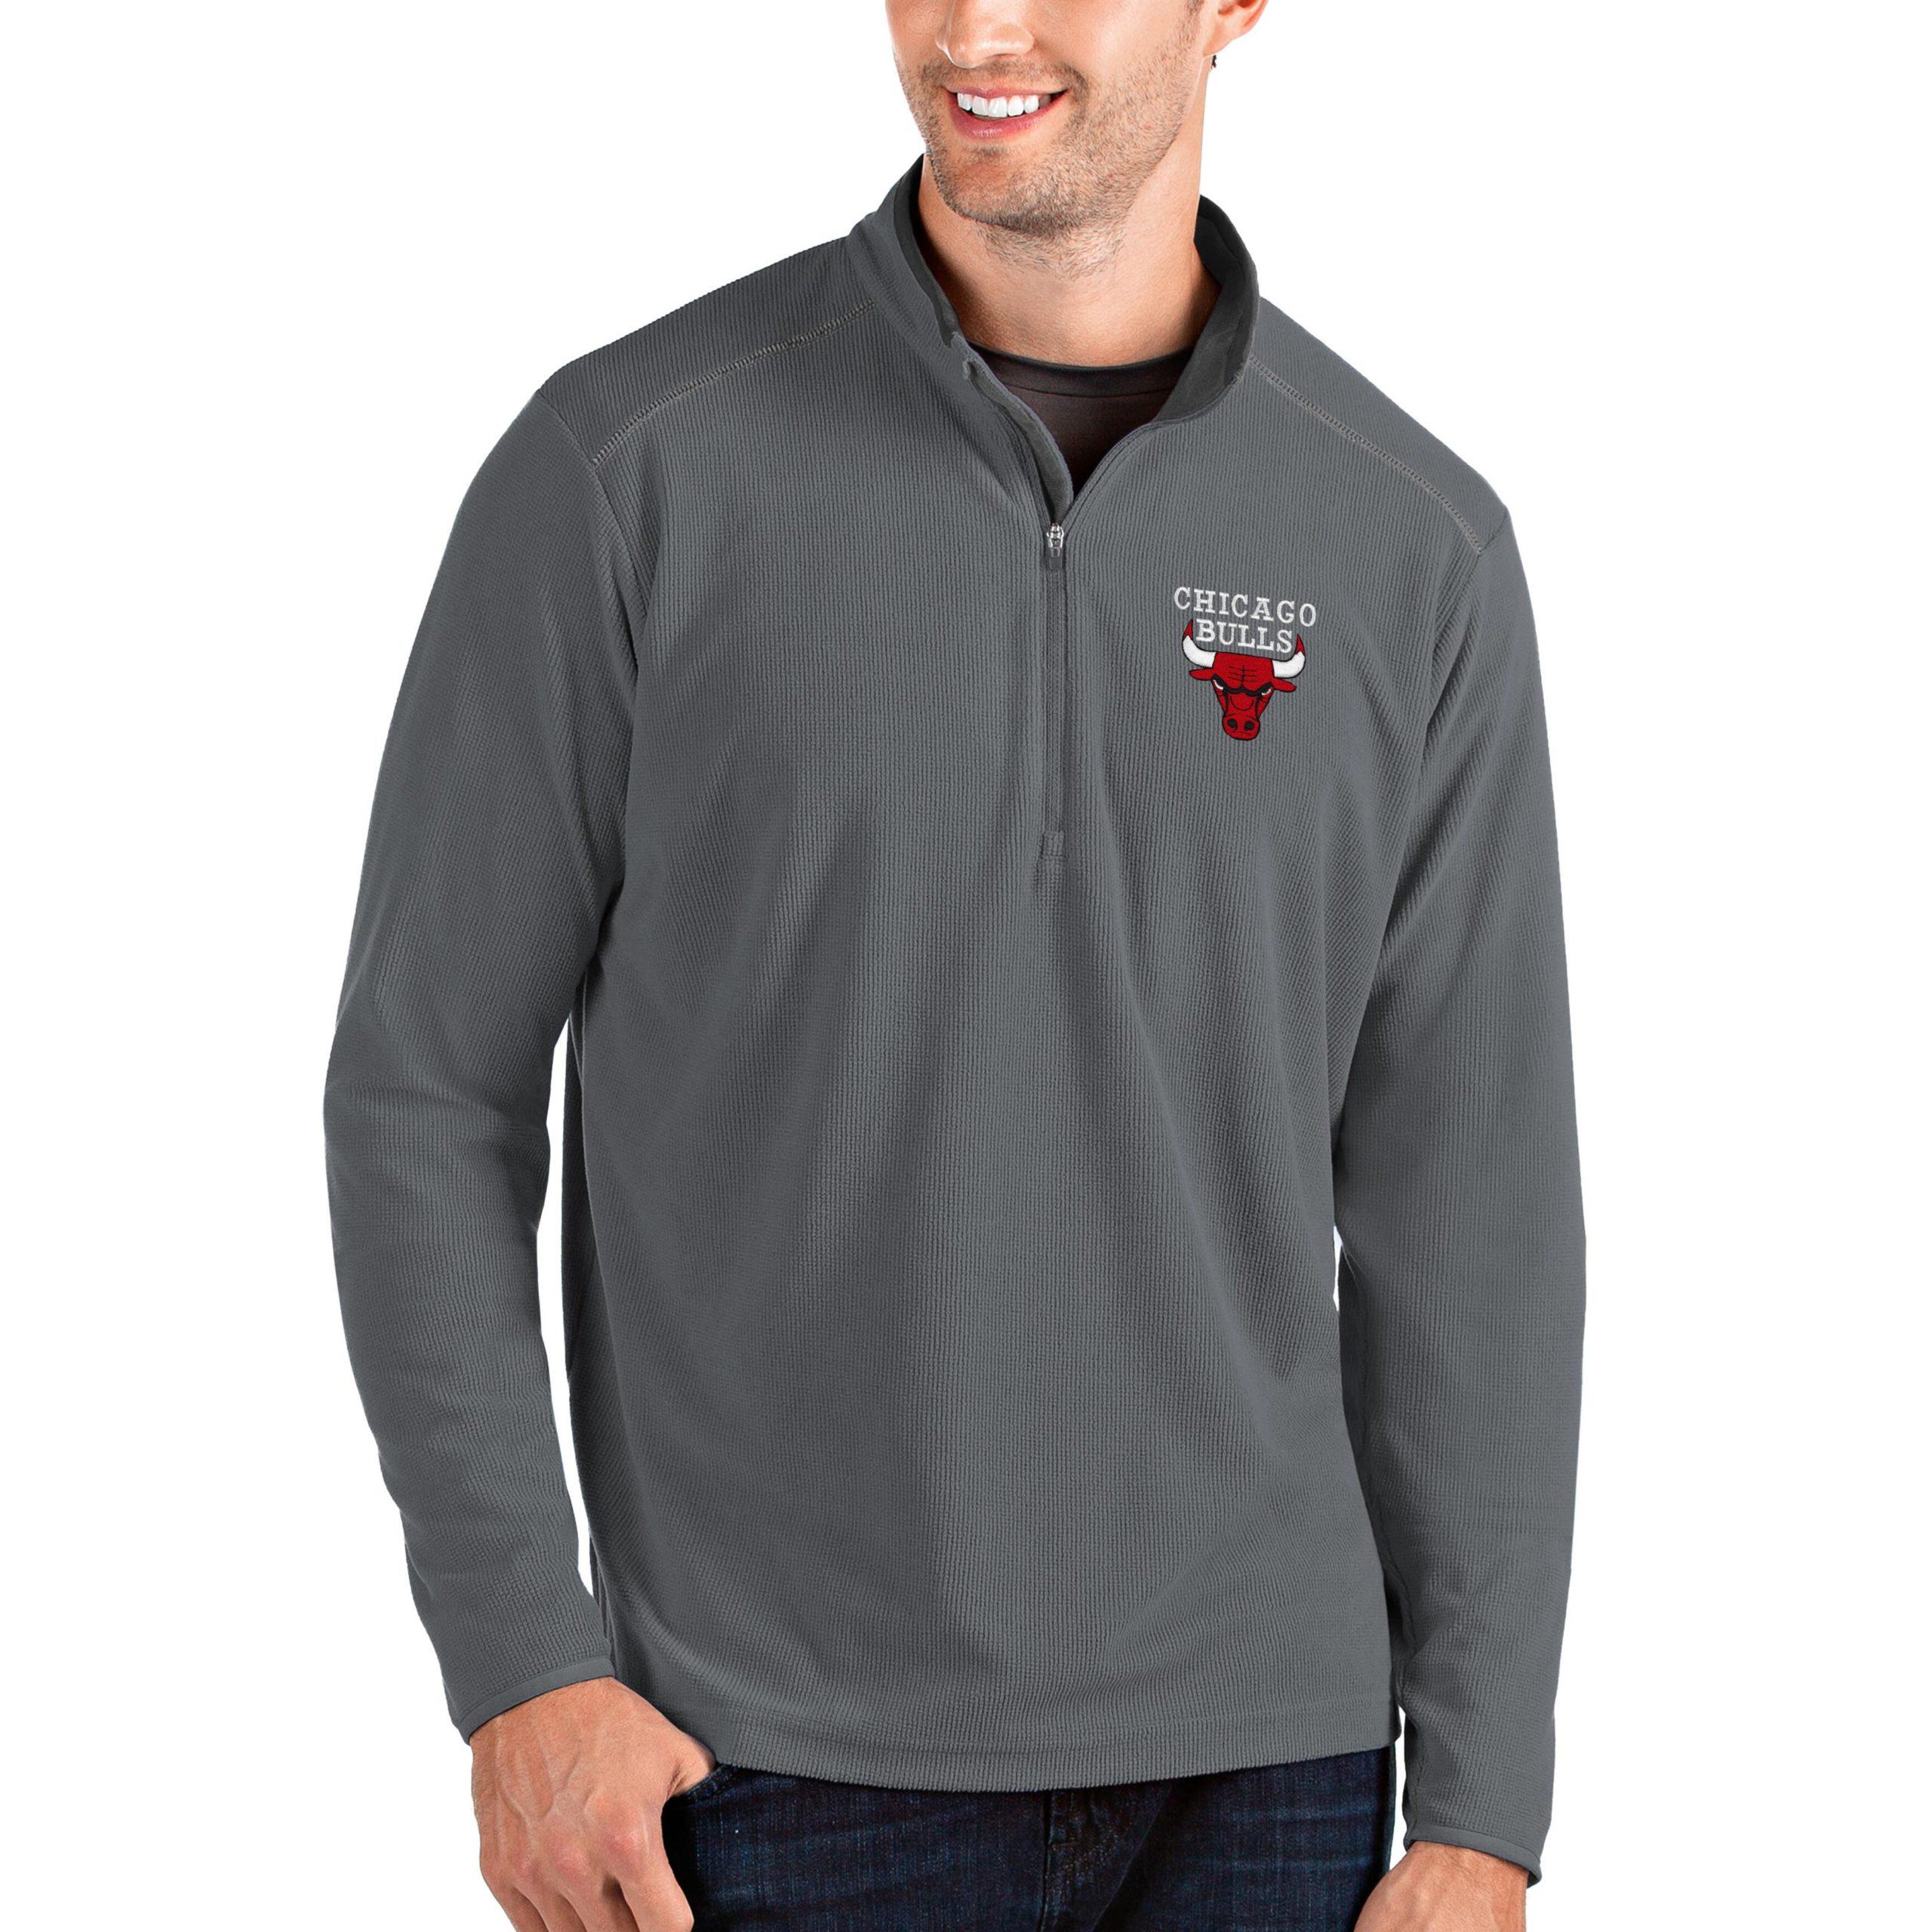 Chicago Bulls Antigua Big & Tall Glacier Quarter-Zip Pullover Jacket - Gray/Gray